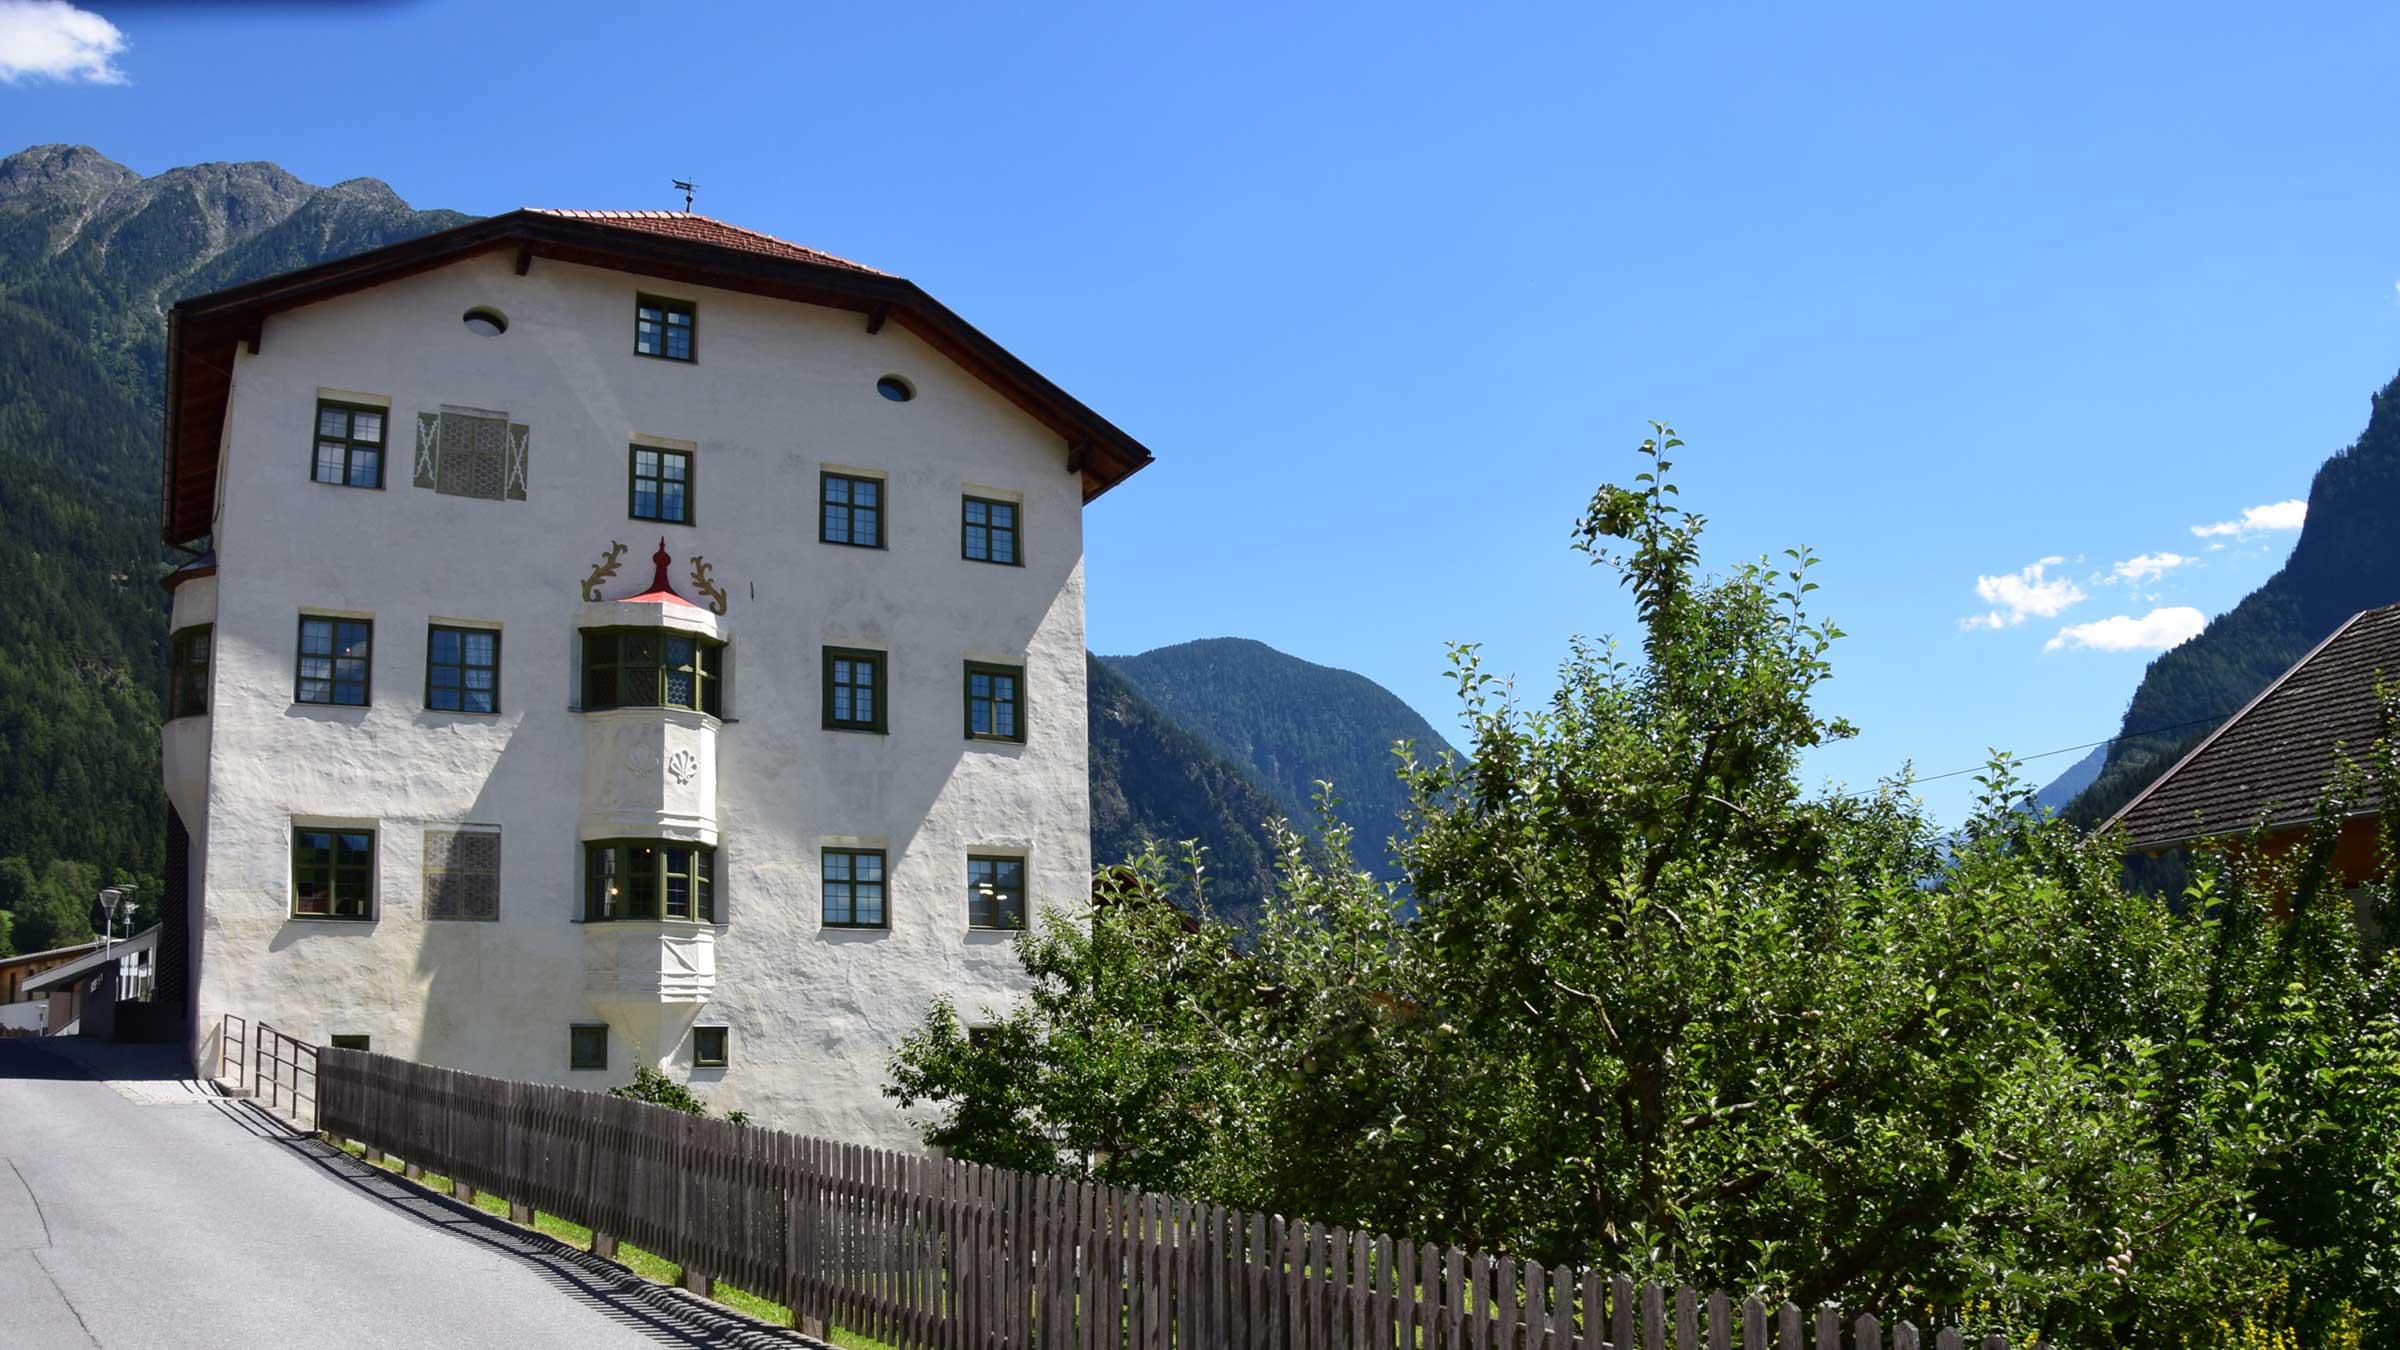 Turmmuseum Oetz - Oetz Ostern